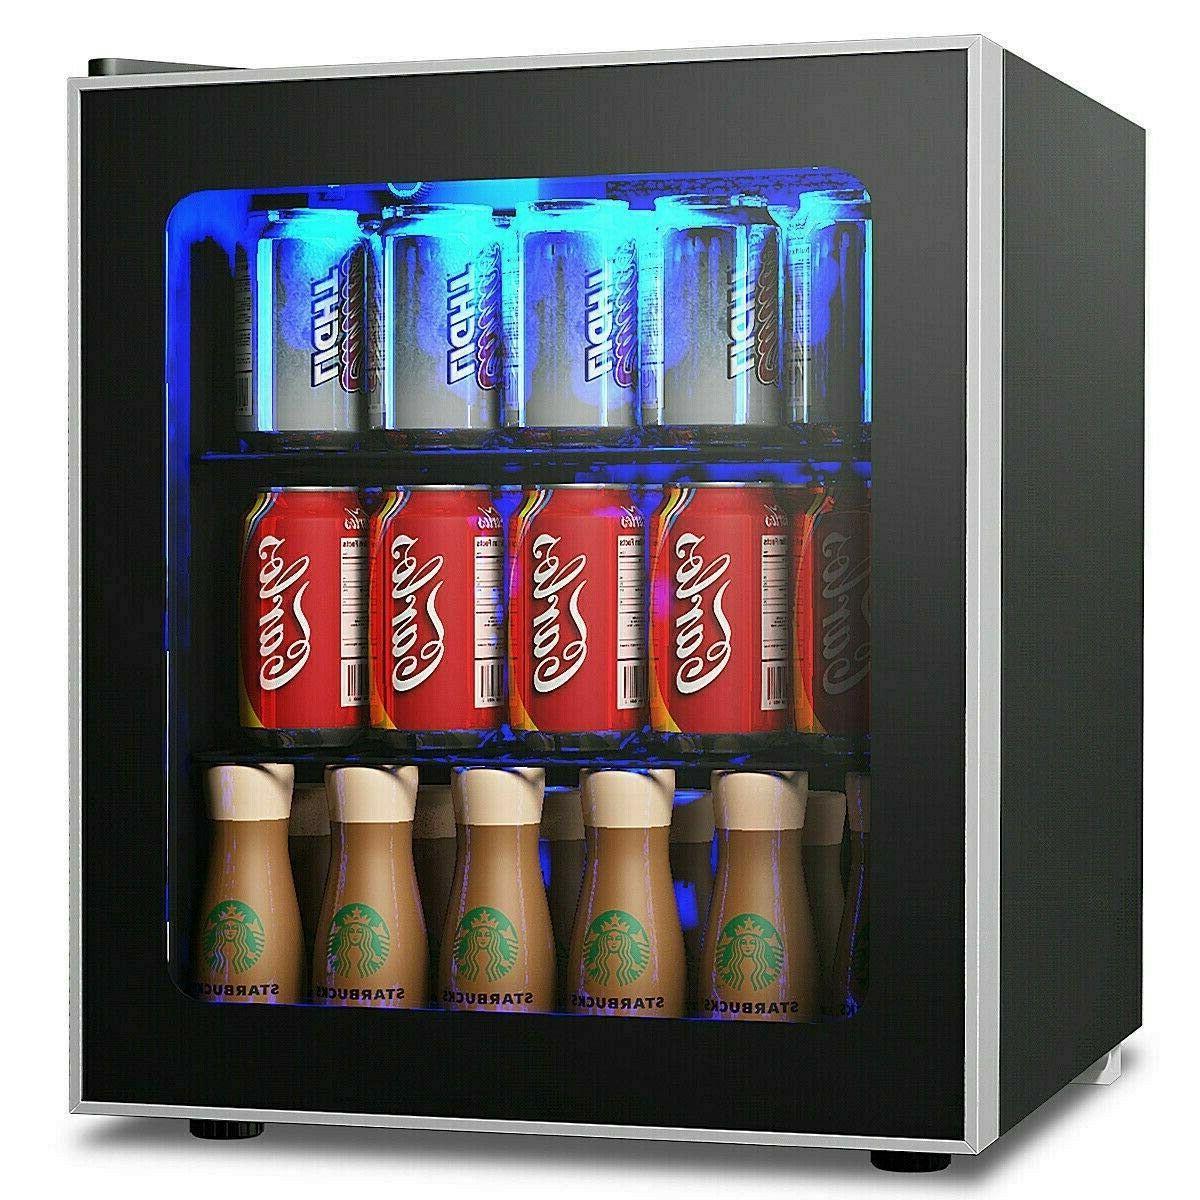 chic new mini fridge 60 cans adjustable